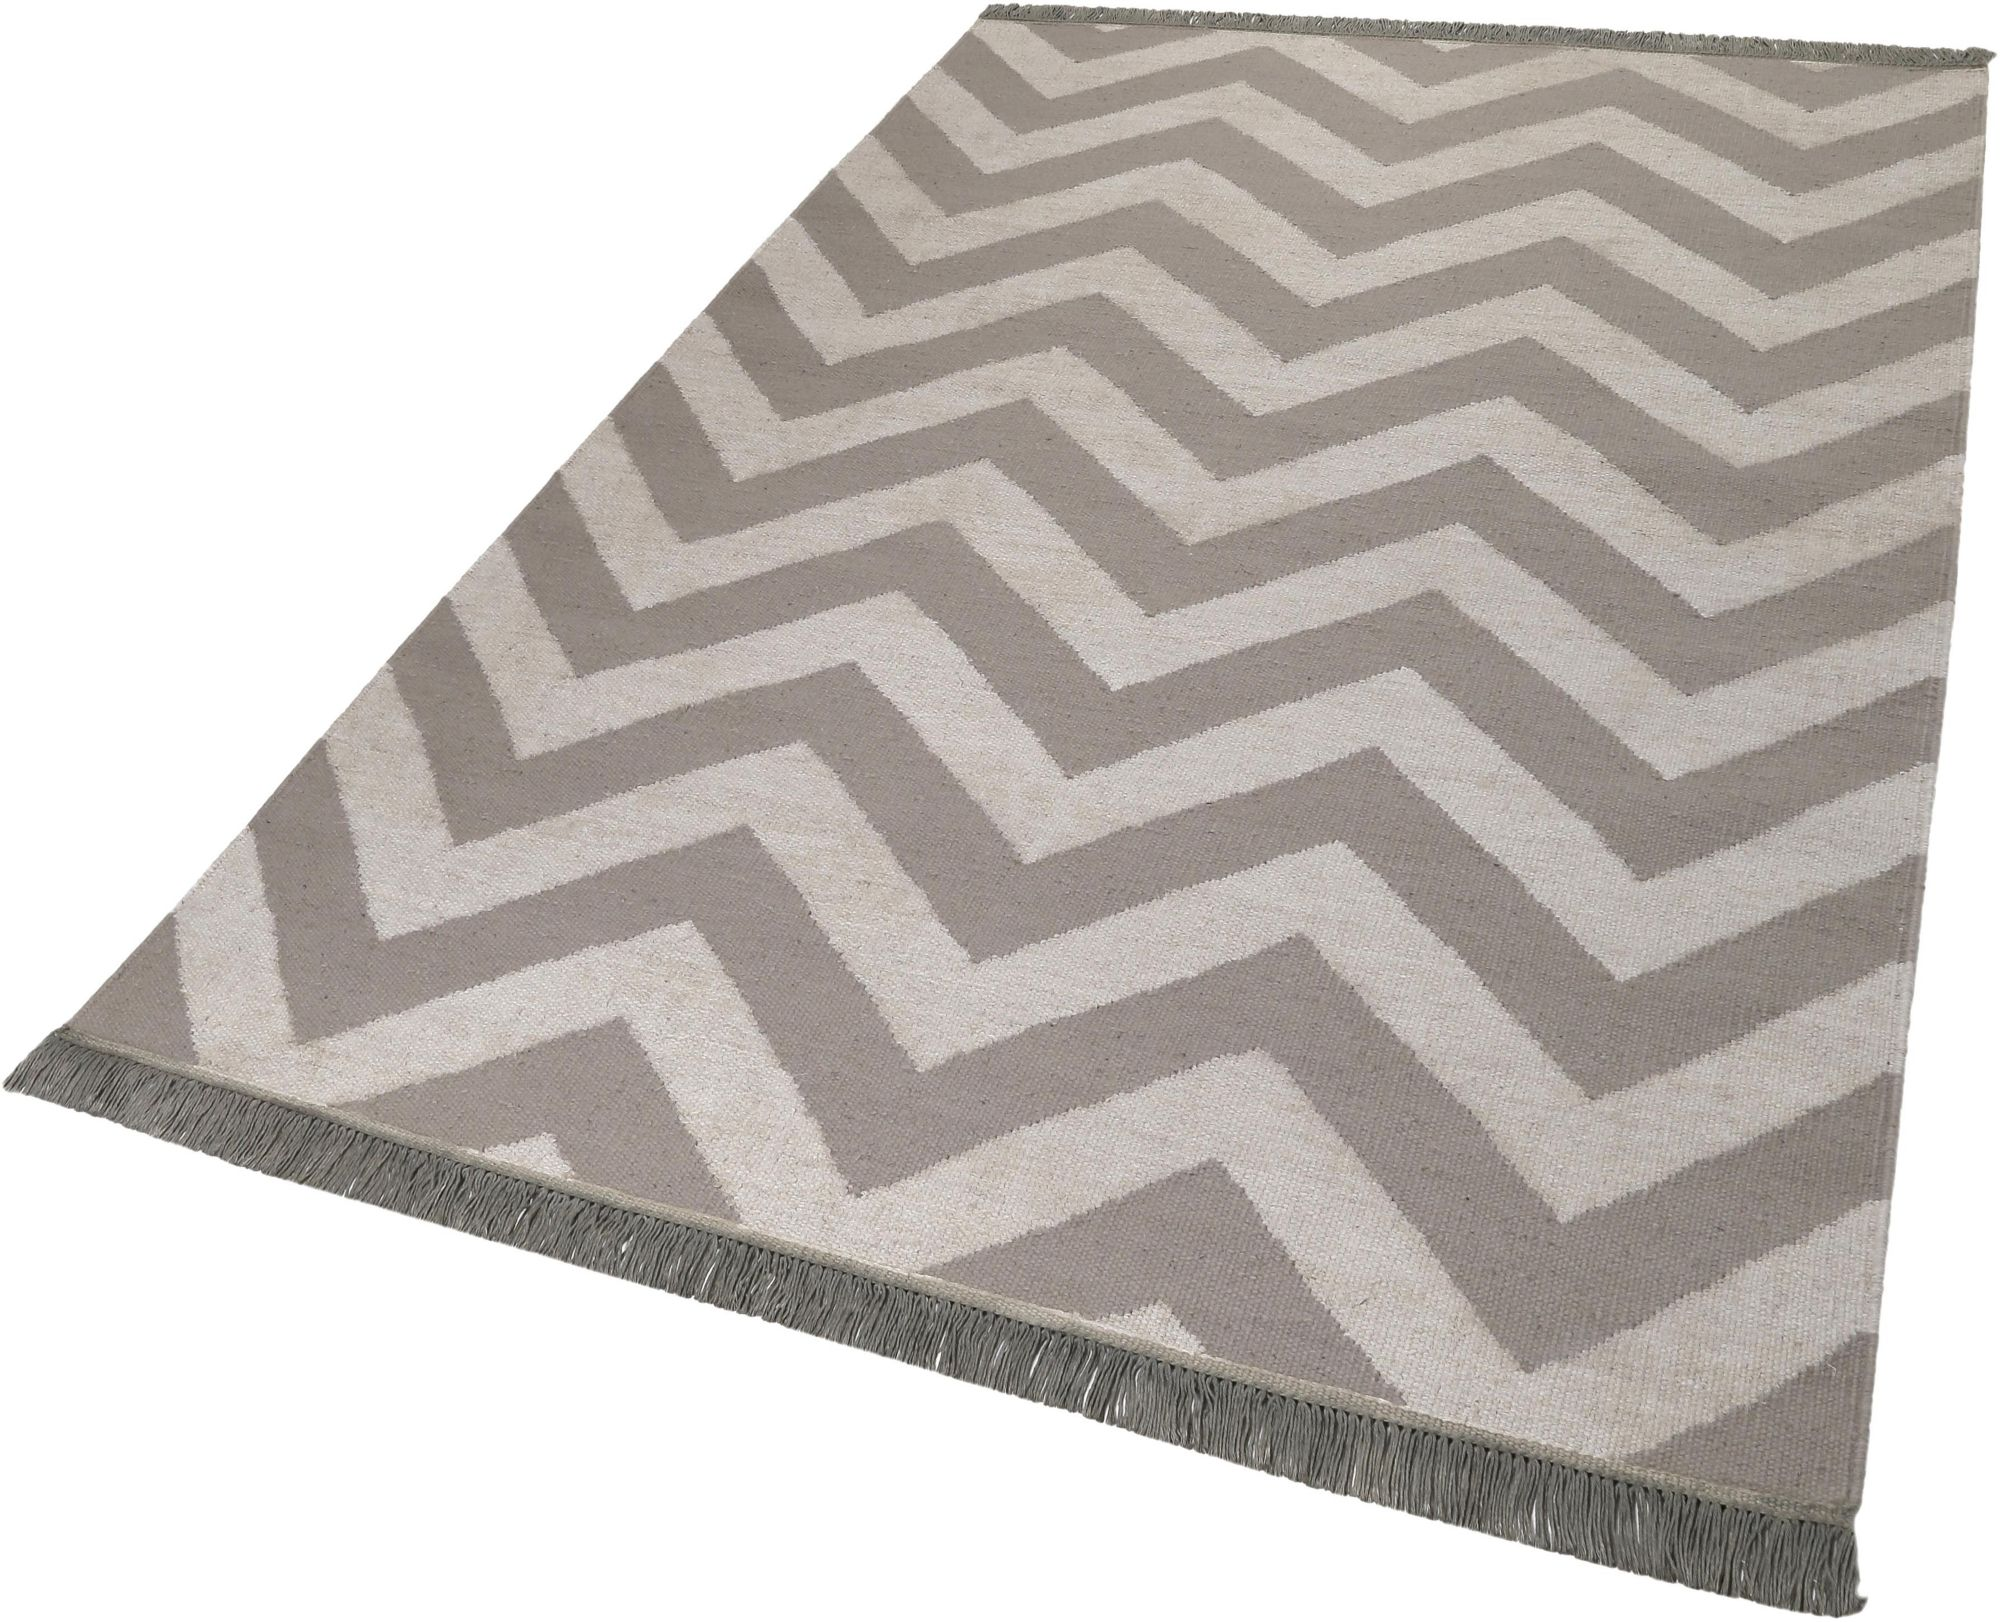 CARPETSCO Teppich, Carpets&Co, »Zig-Zag«, Höhe: 5 mm, handgewebt